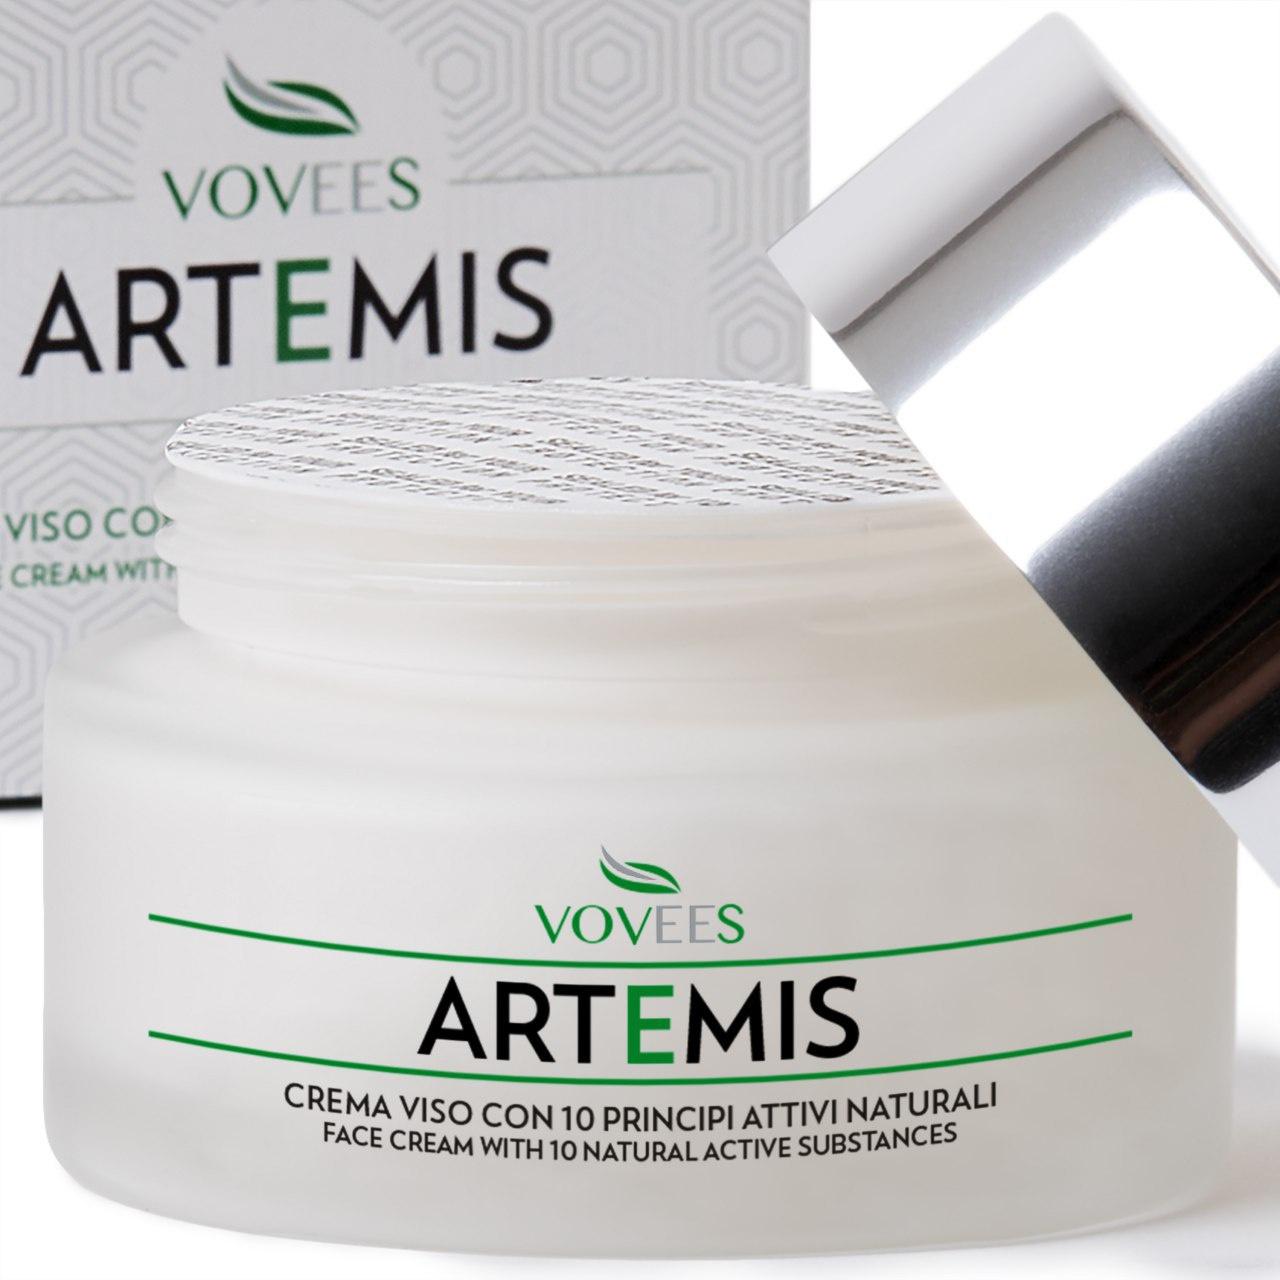 Vovees Artemis Crema Viso